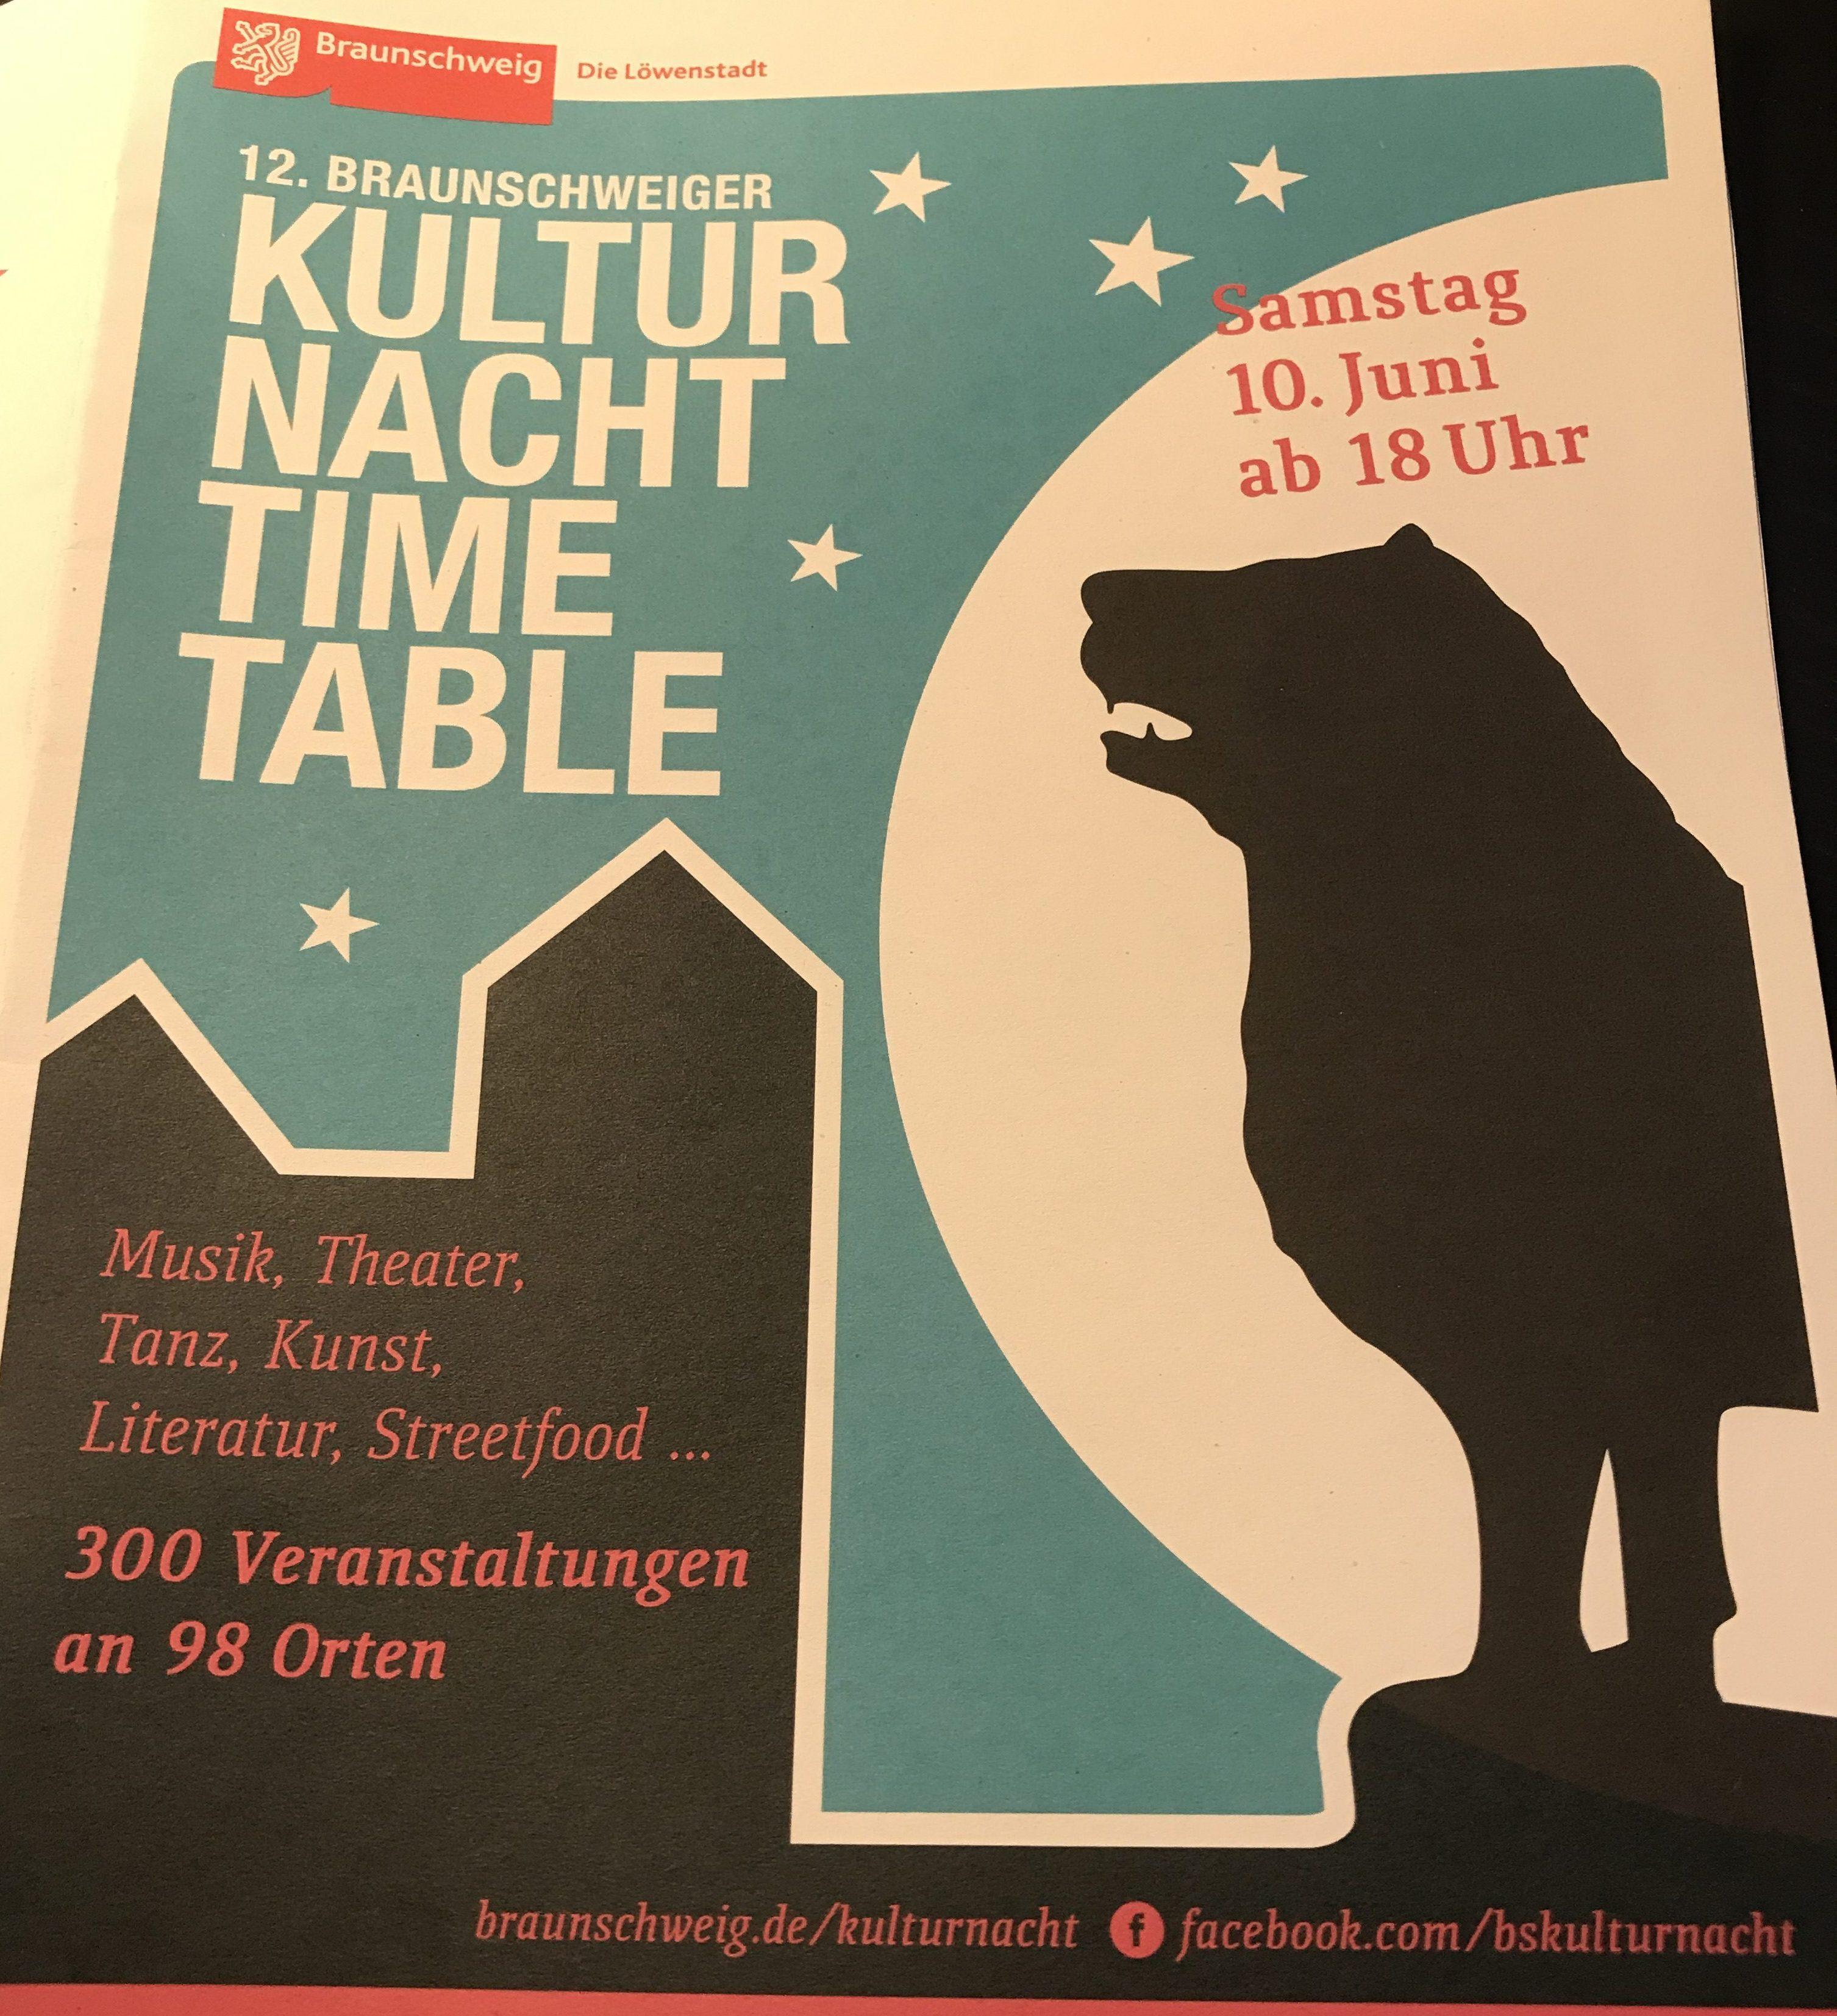 Kulturnacht Braunschweig 2017